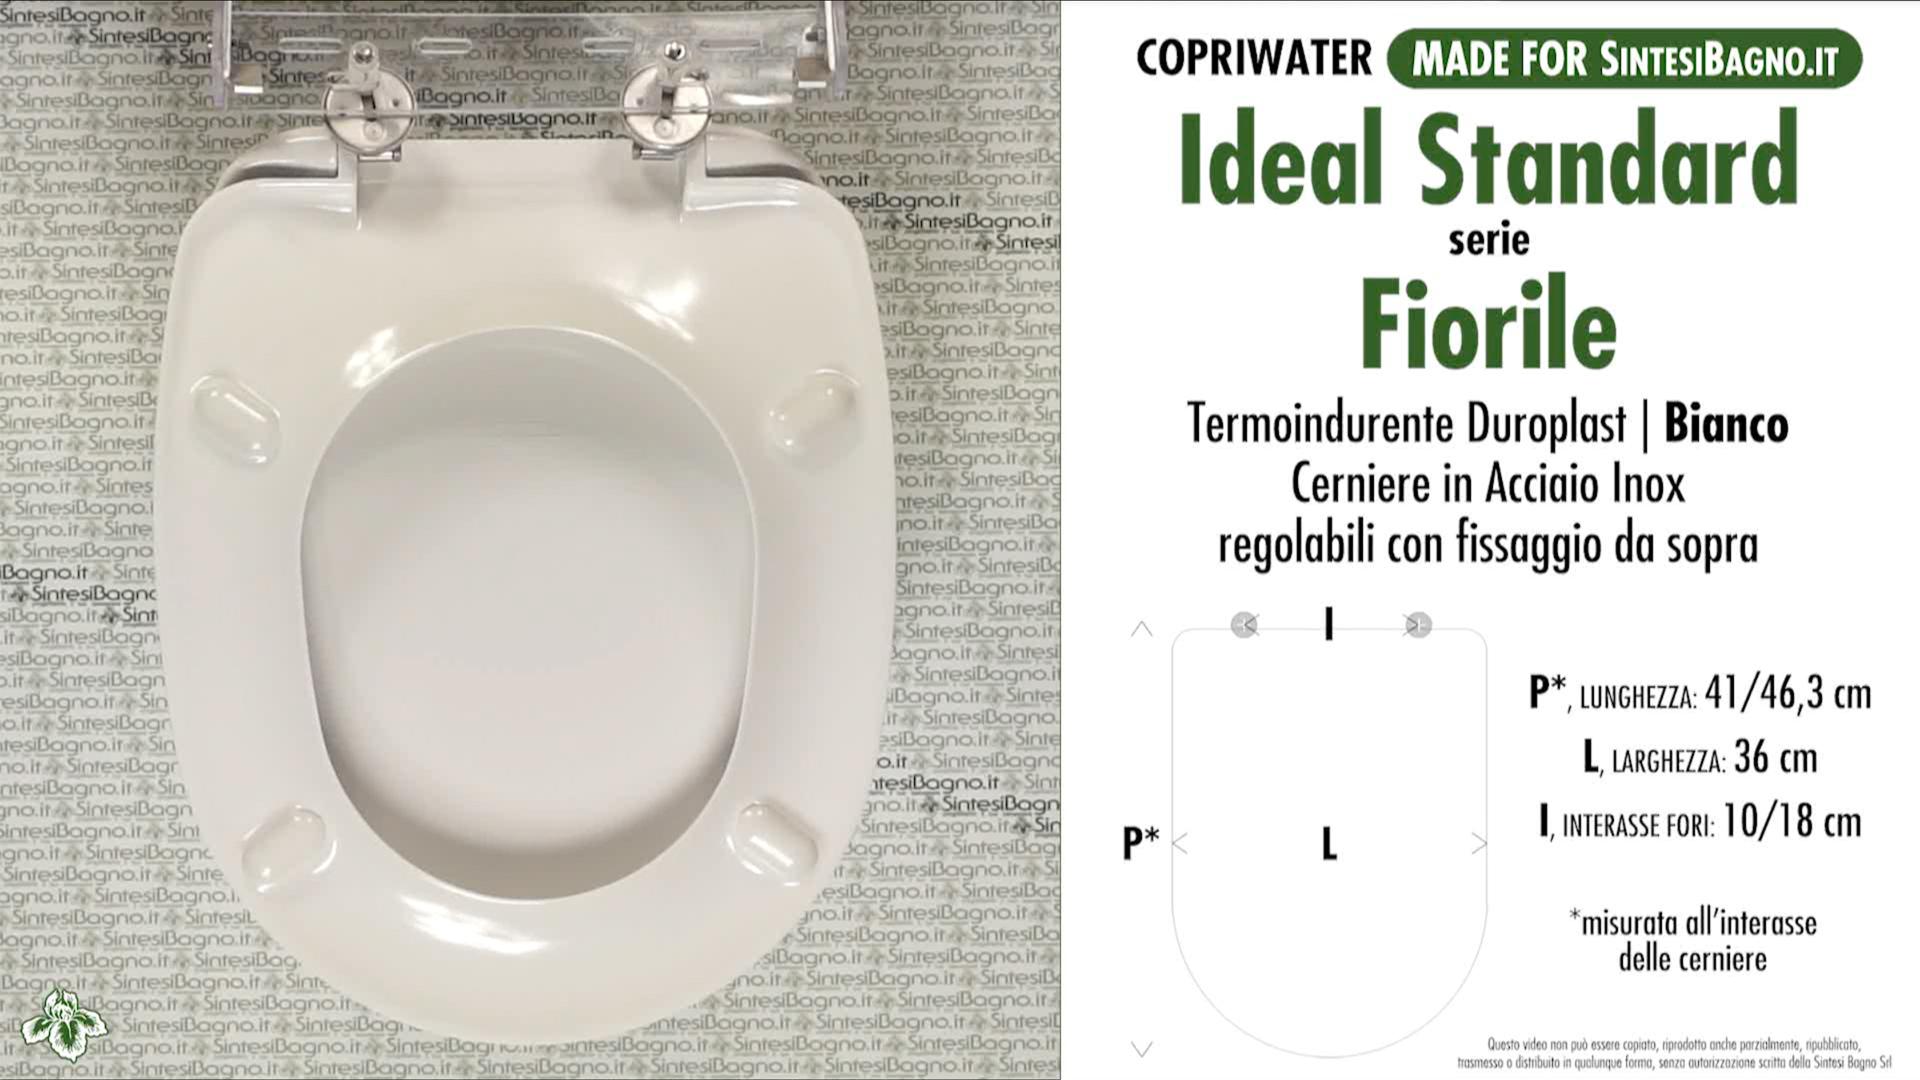 Schede tecniche misure copriwater ideal standard serie fiorile for Calla ideal standard scheda tecnica